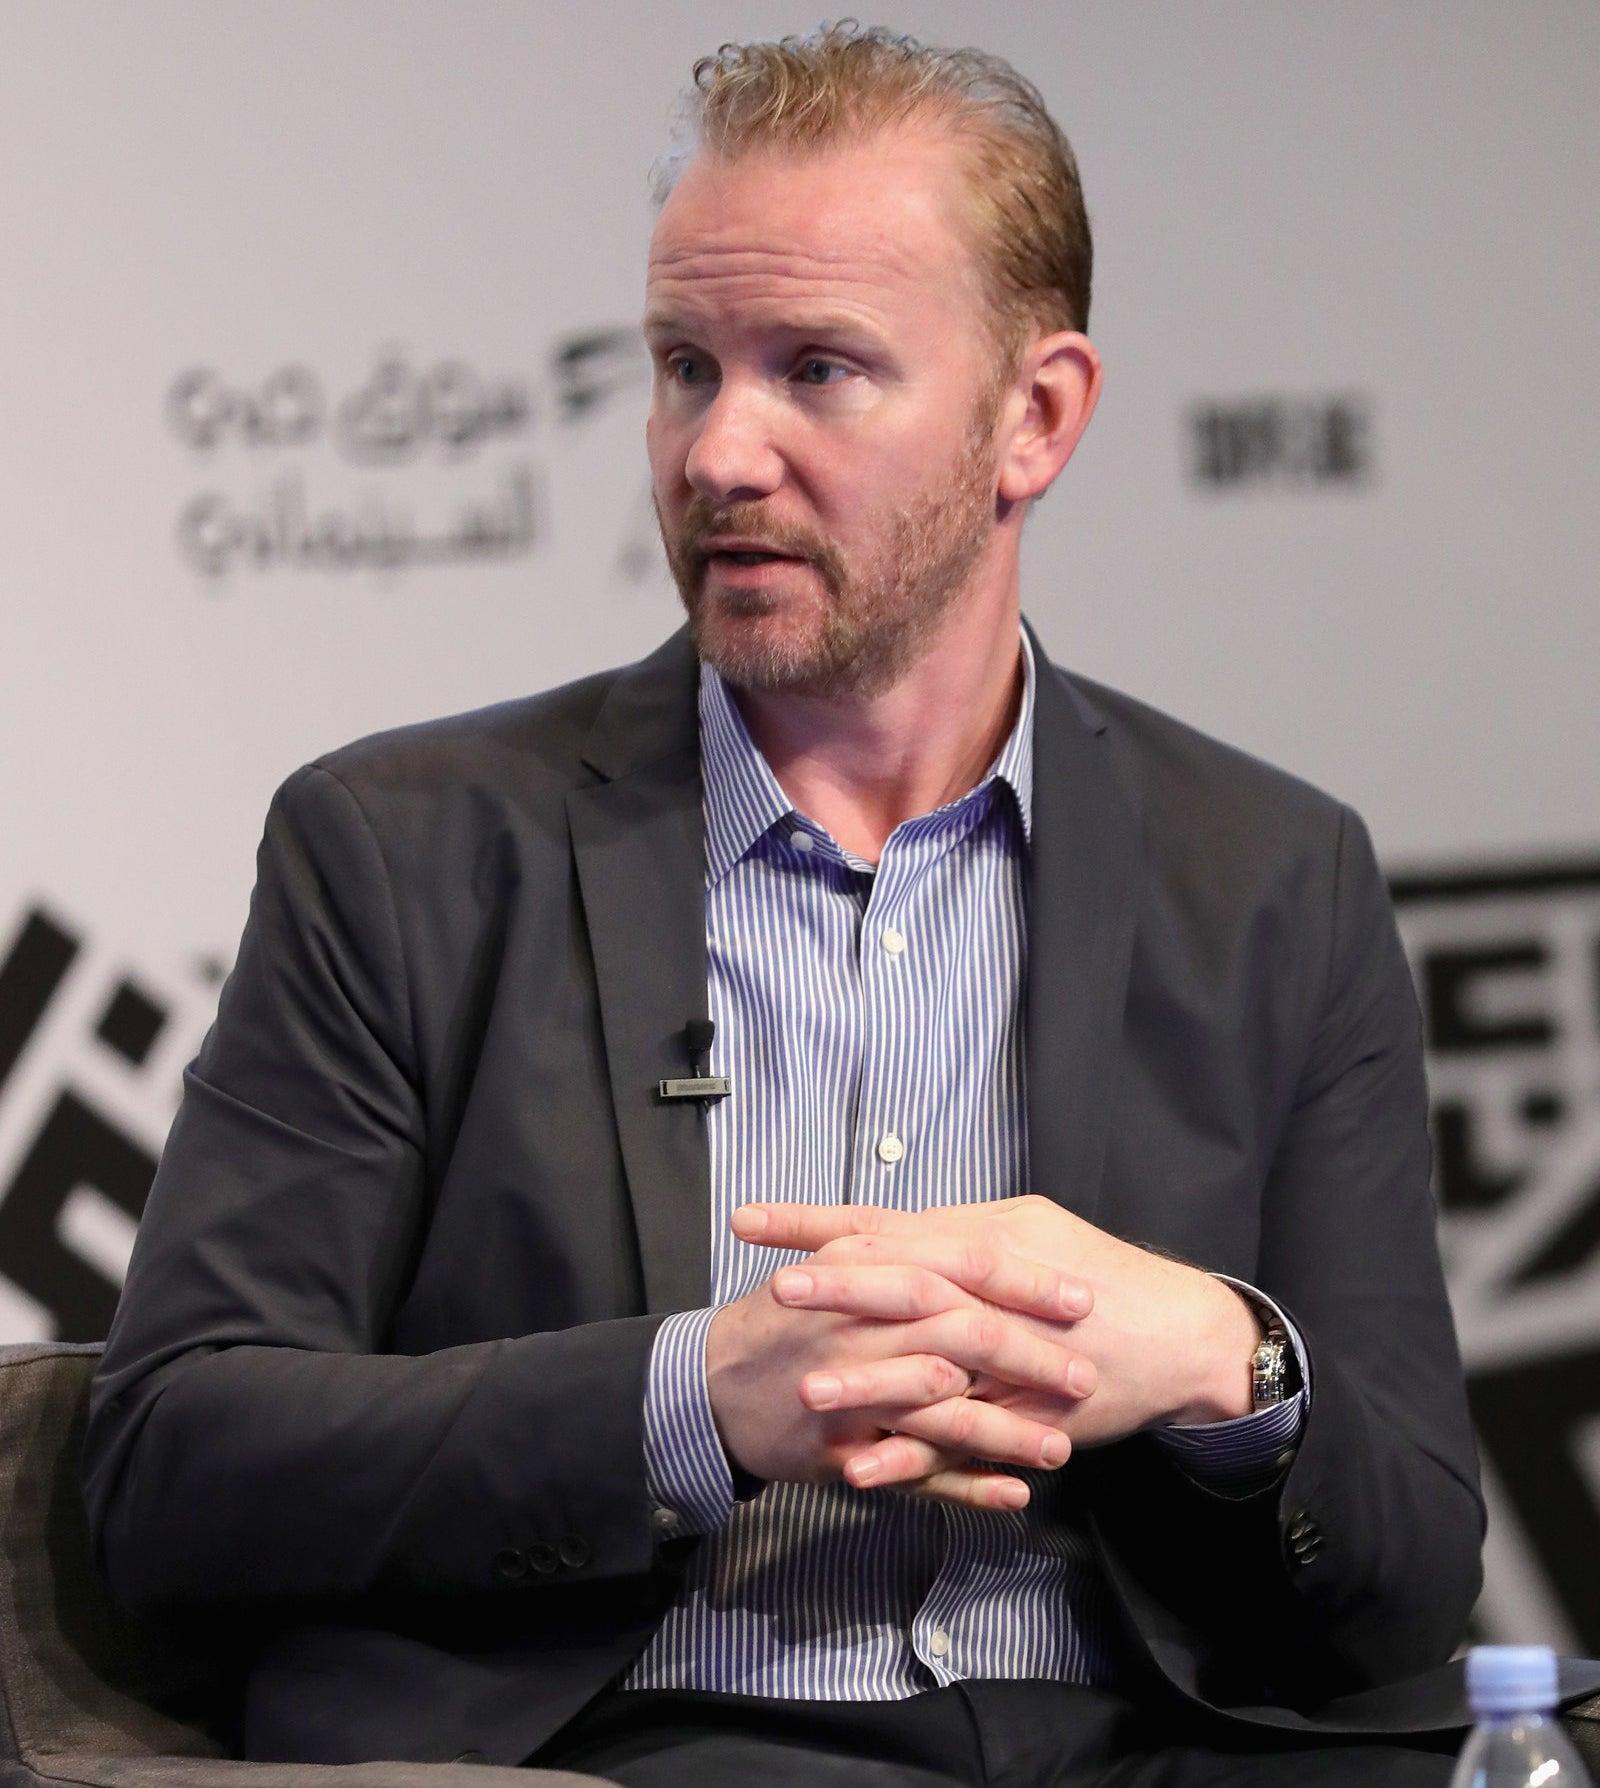 Morgan Spurlock speaks on stage during the 14th annual Dubai International Film Festival held at the Madinat Jumeriah Complex, Dec. 11, 2017.